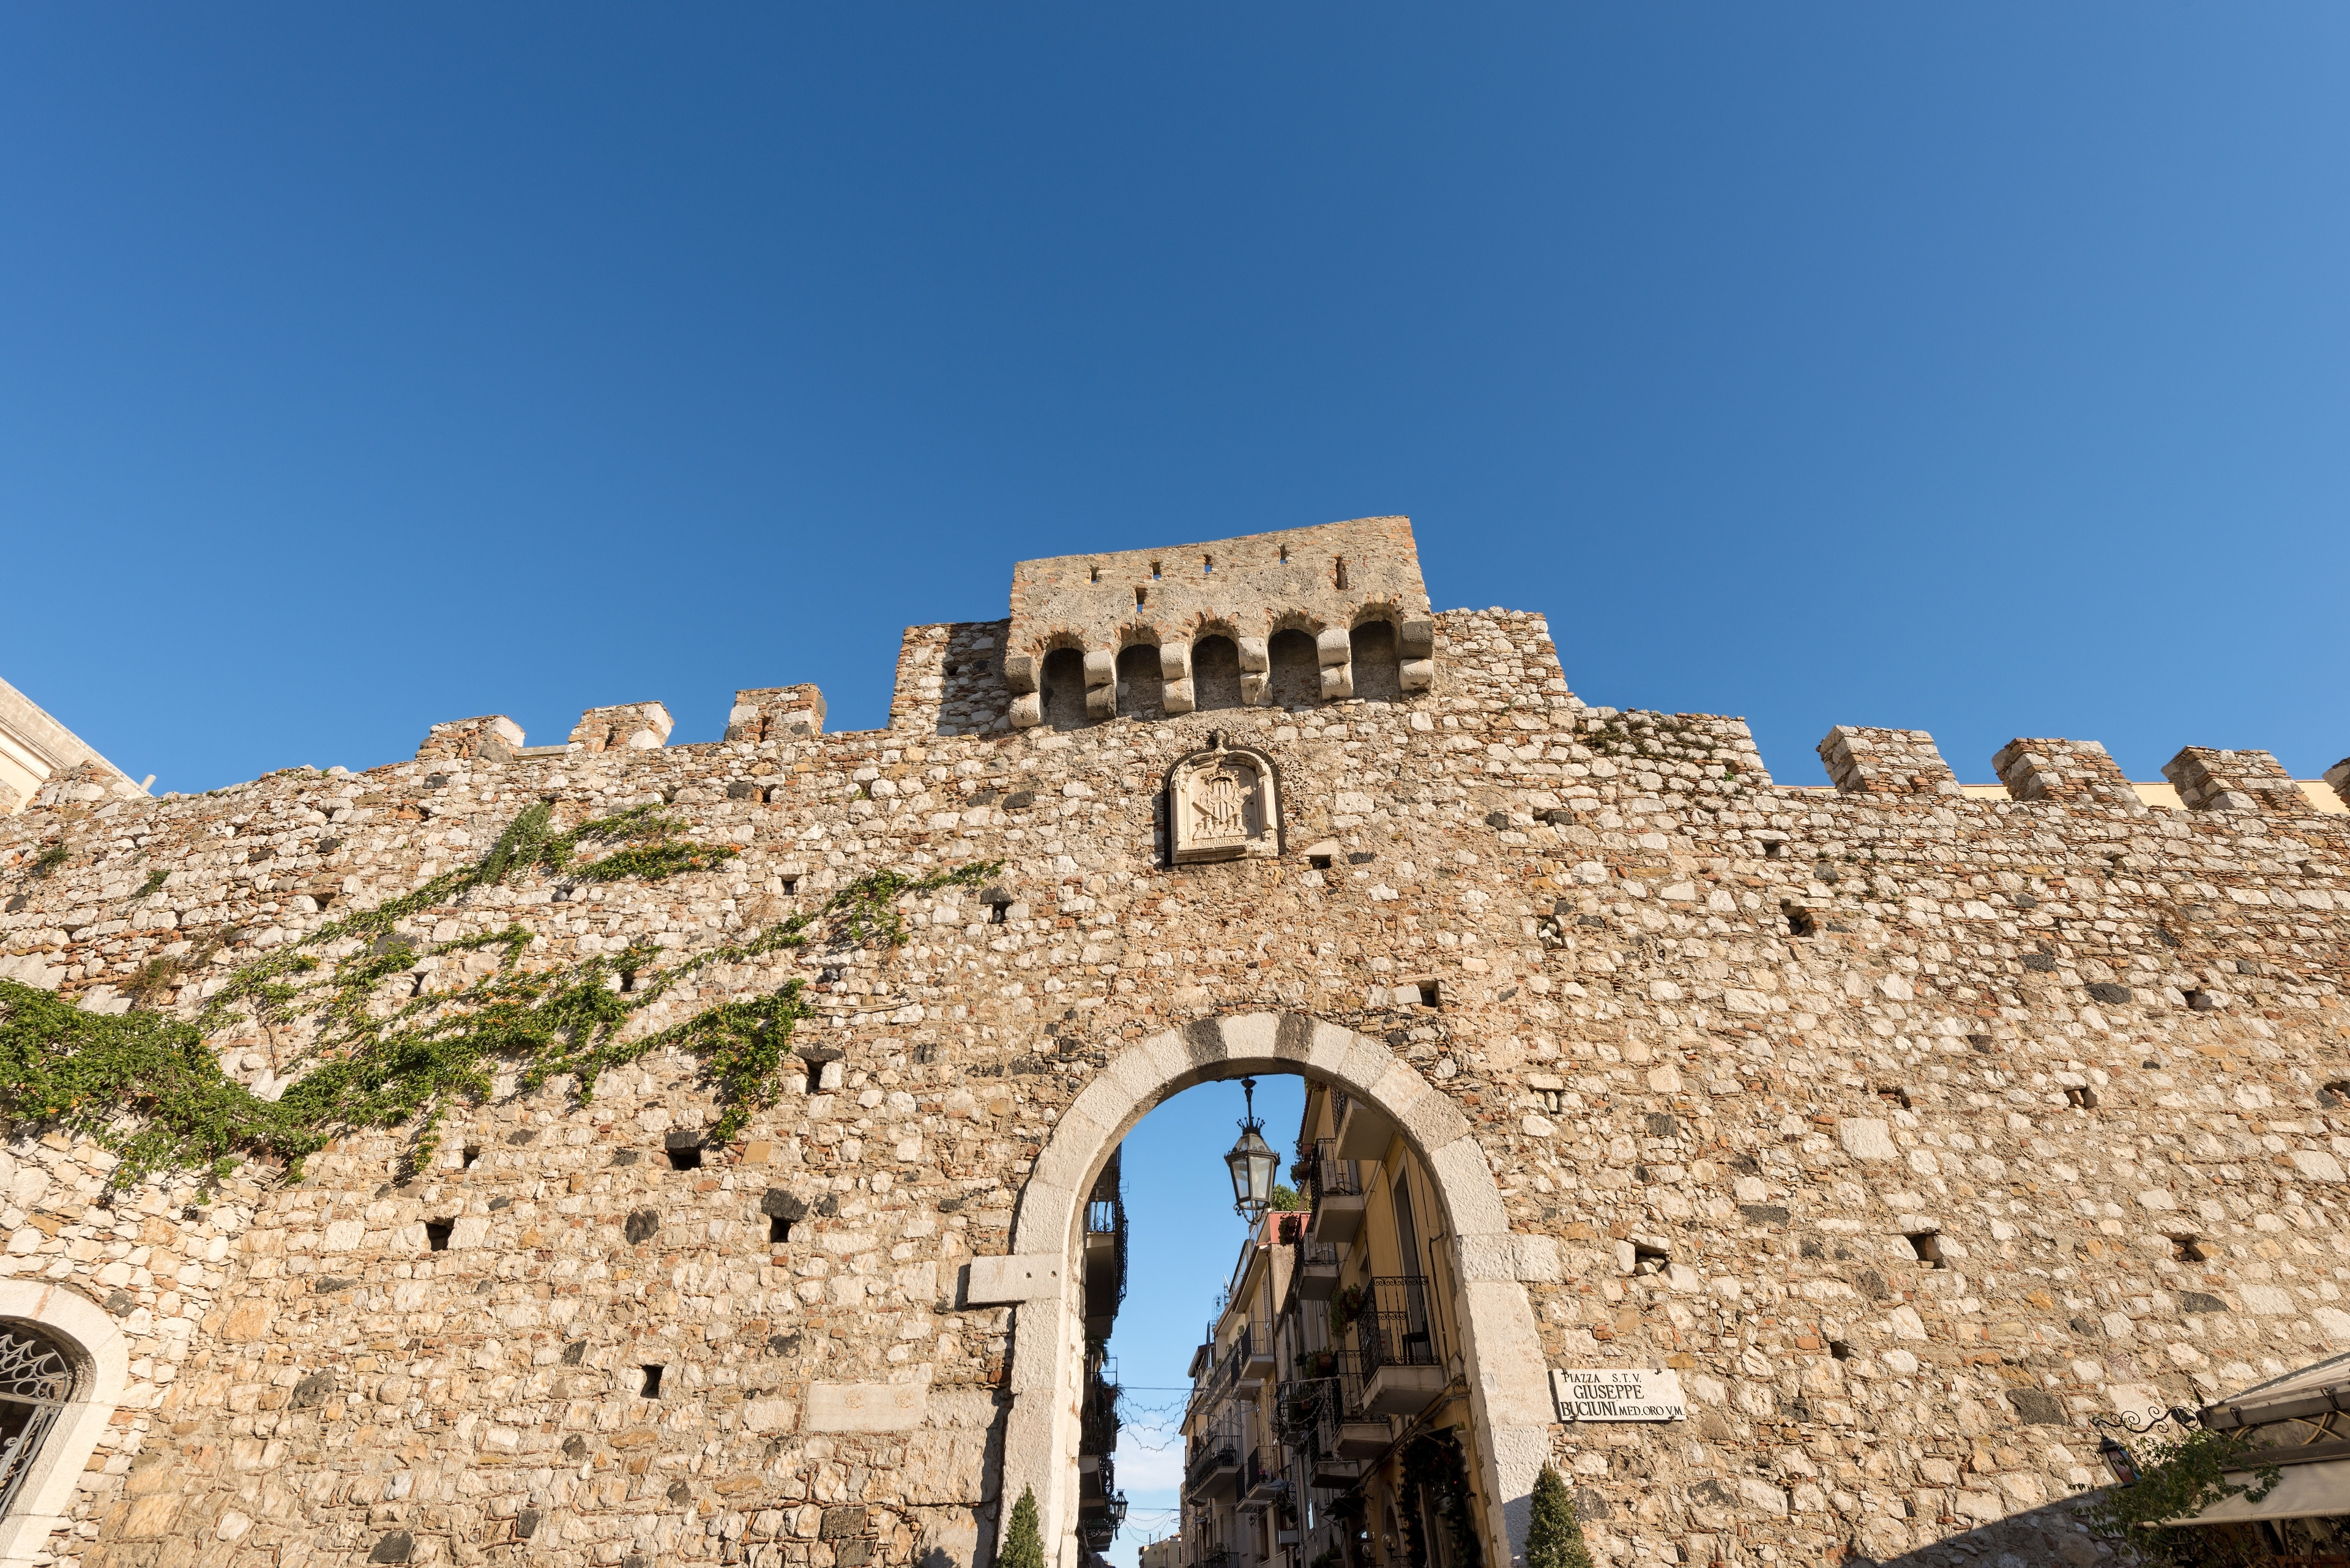 Porta di Catania, Taormina, Sizilien, Italien